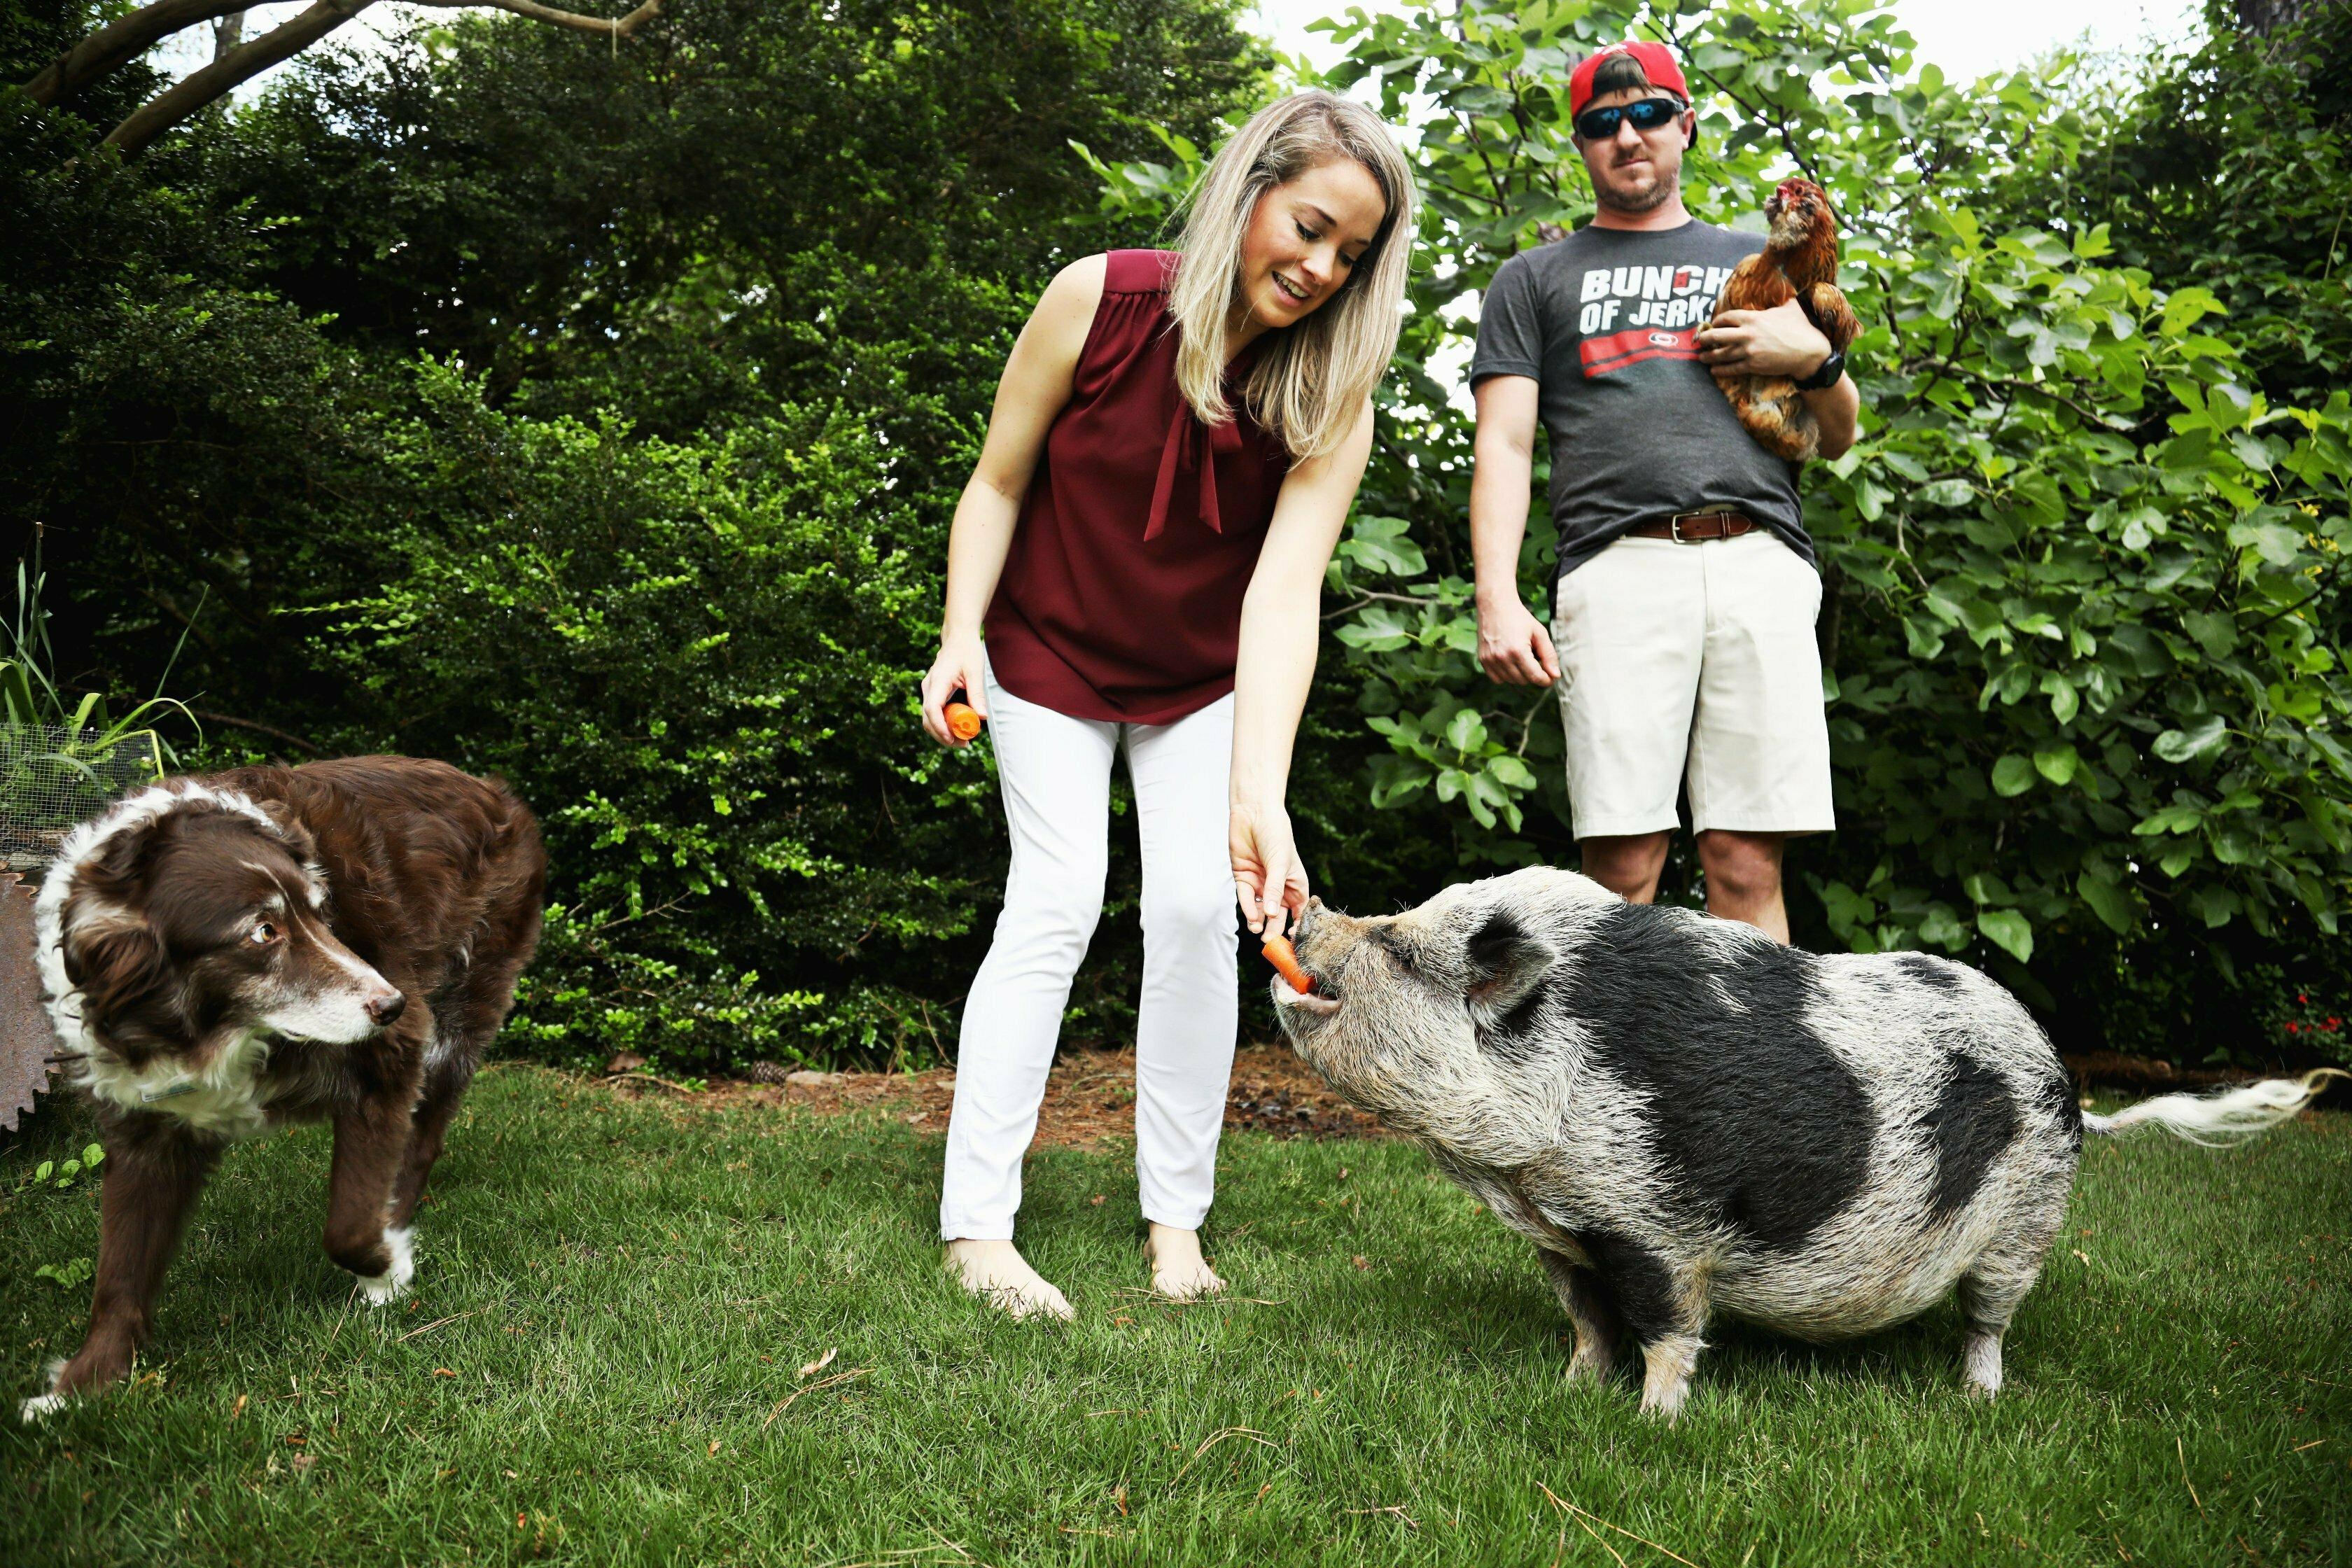 Sooey! Pig named Hamilton bringing Hurricanes playoff luck